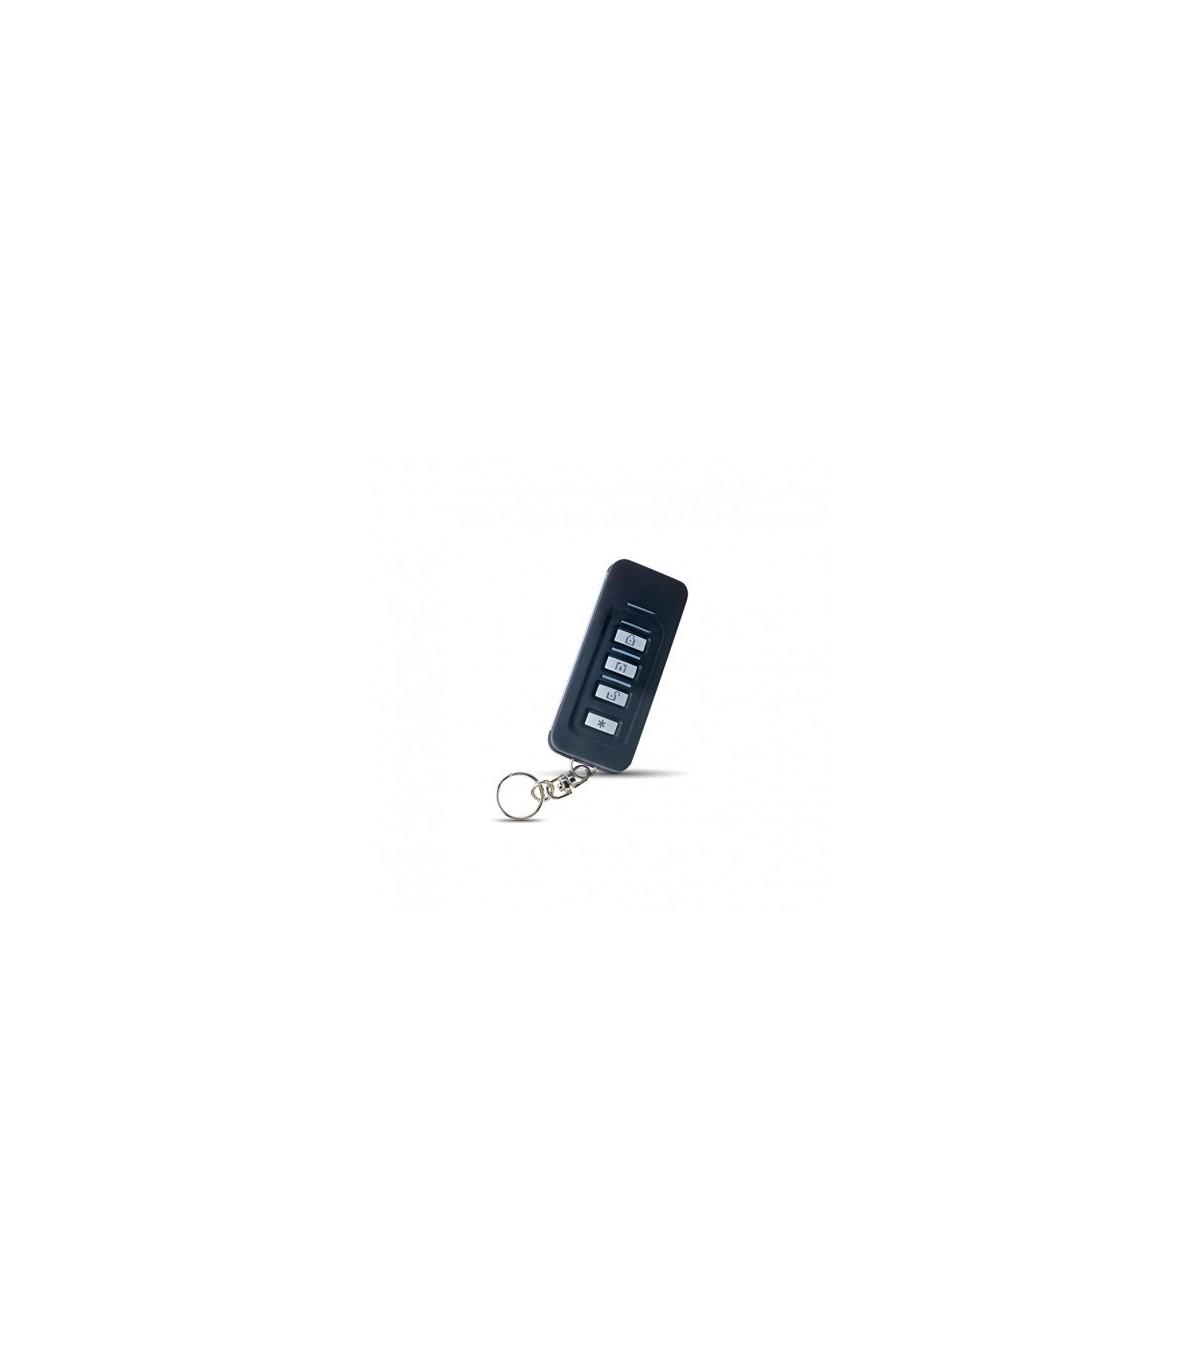 Visonic KF-235 PG2 PowerMaster Wireless 4 Button Two-Way Alarm System Keyfob